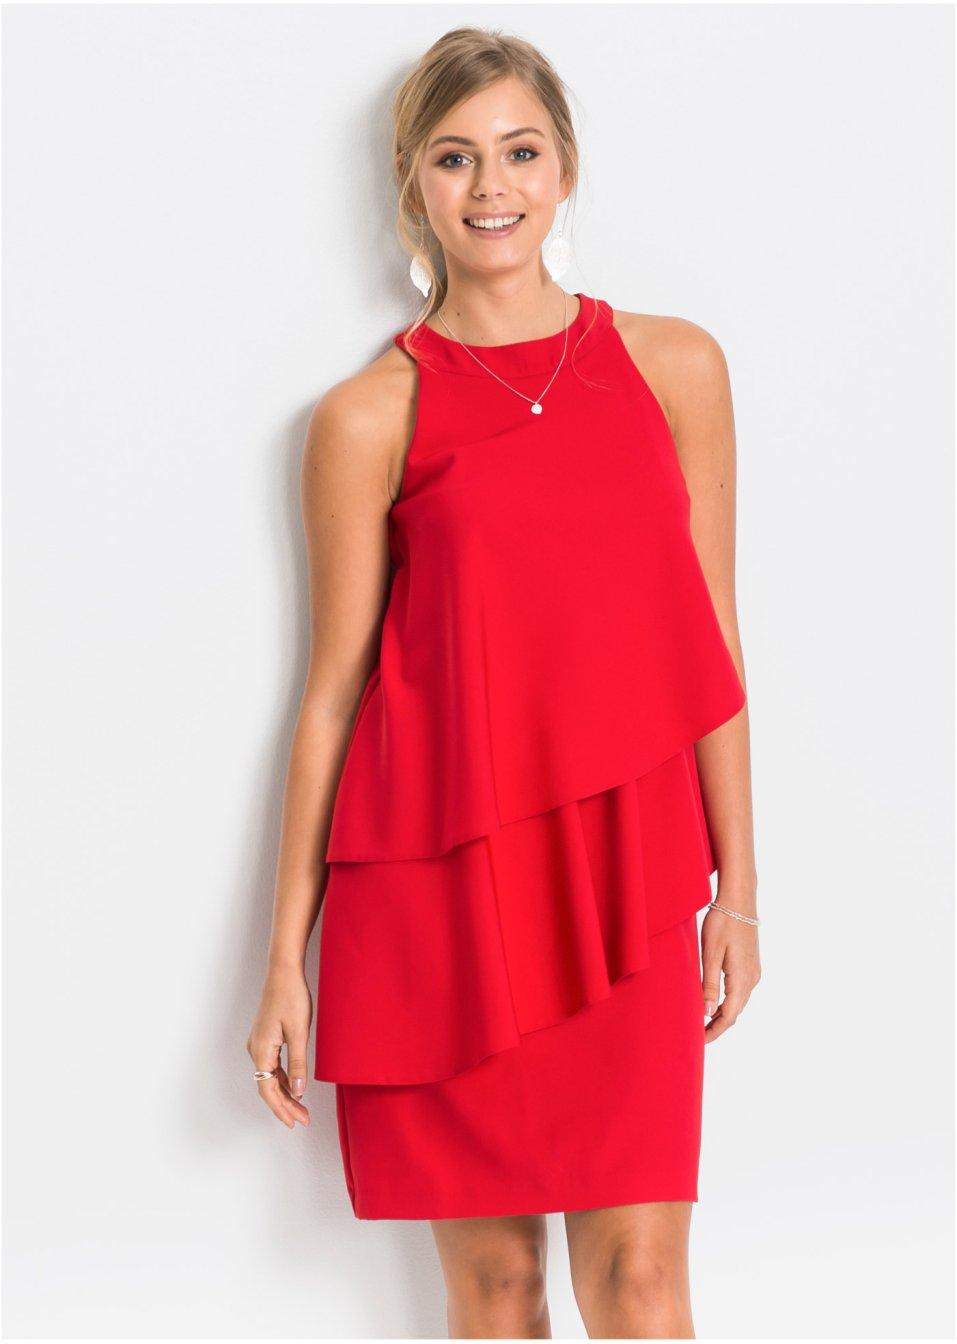 Klänning röd - RAINBOW beställa online - bonprix.se 935c83a93f4b6